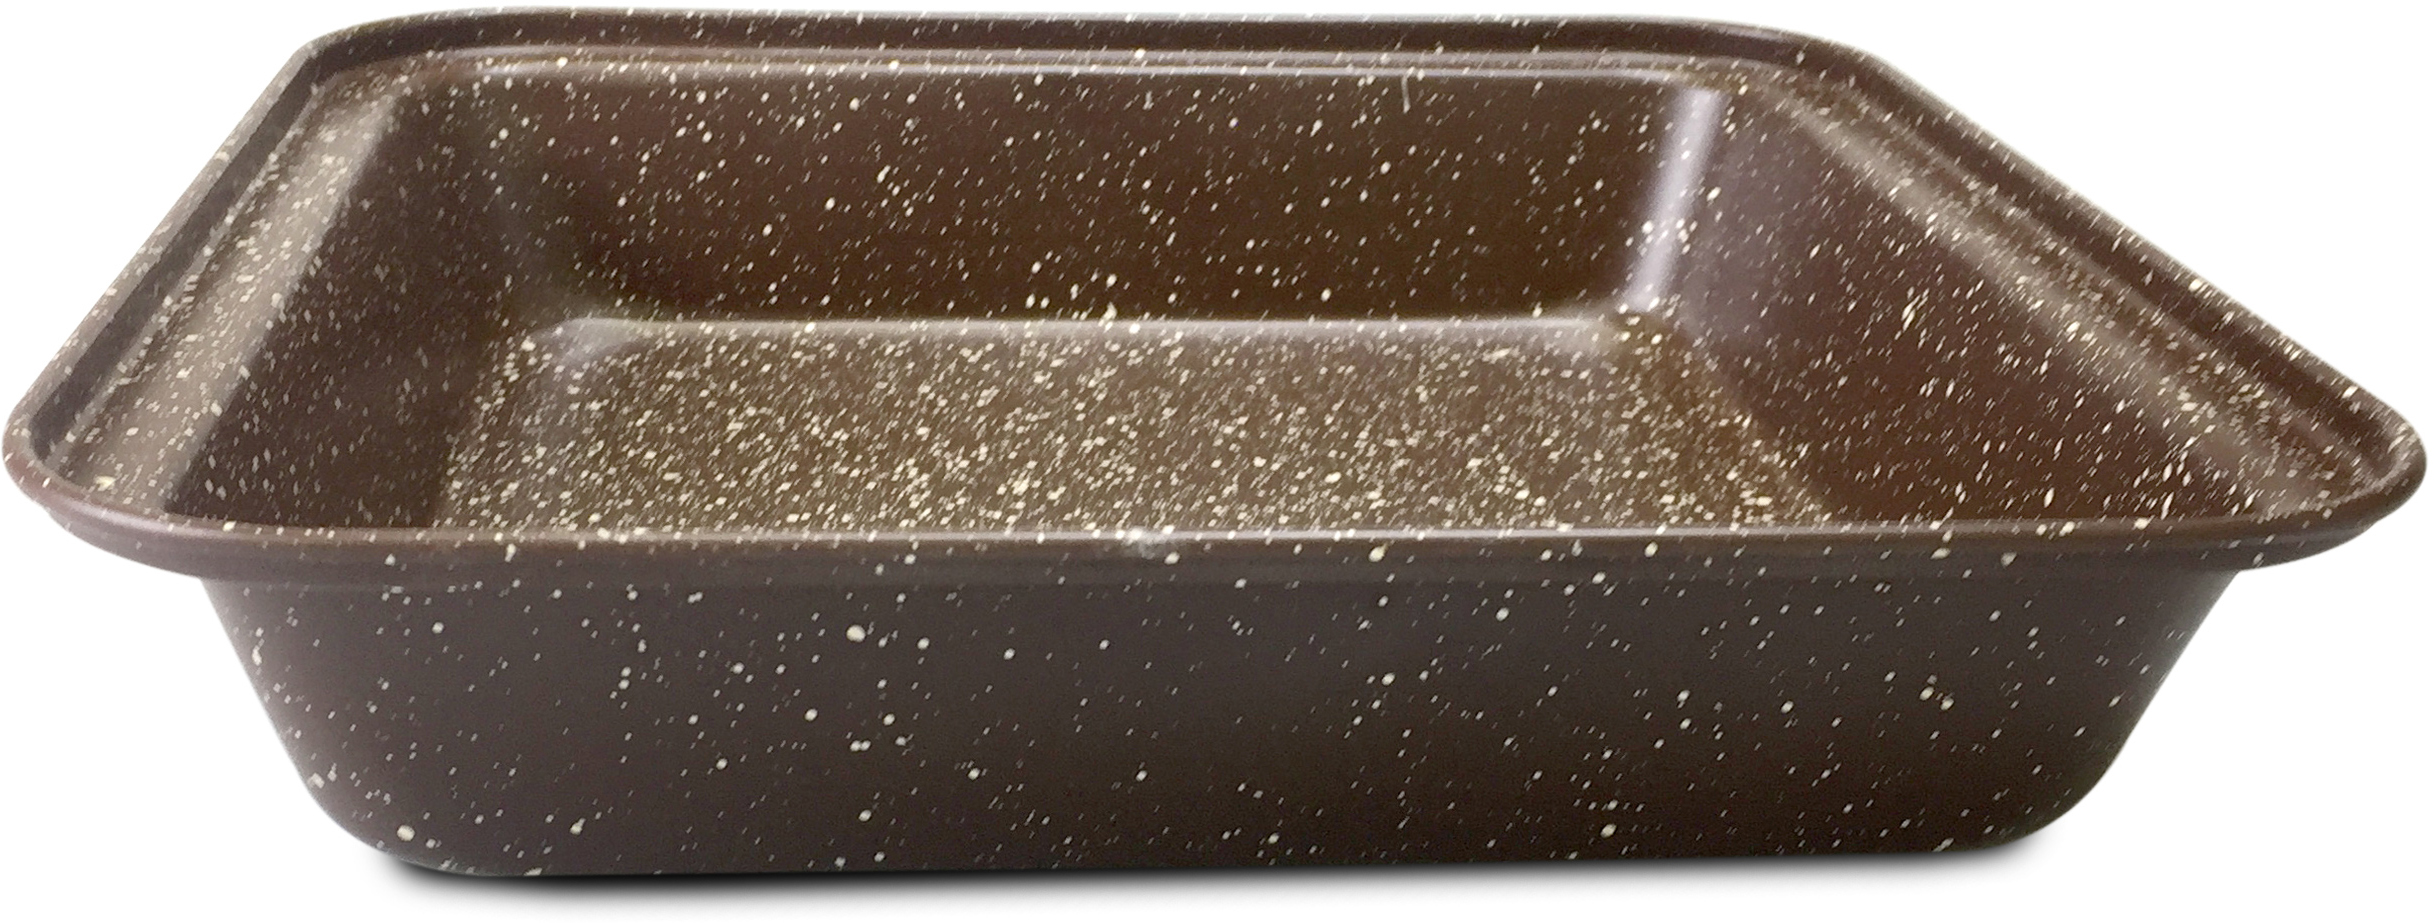 Фото - Форма для кекса Moulinvilla Вrownstone, 23 х 22 х 5 см форма для выпечки хлеба и кекса moulinvilla brownstone 23 х 11 5 см